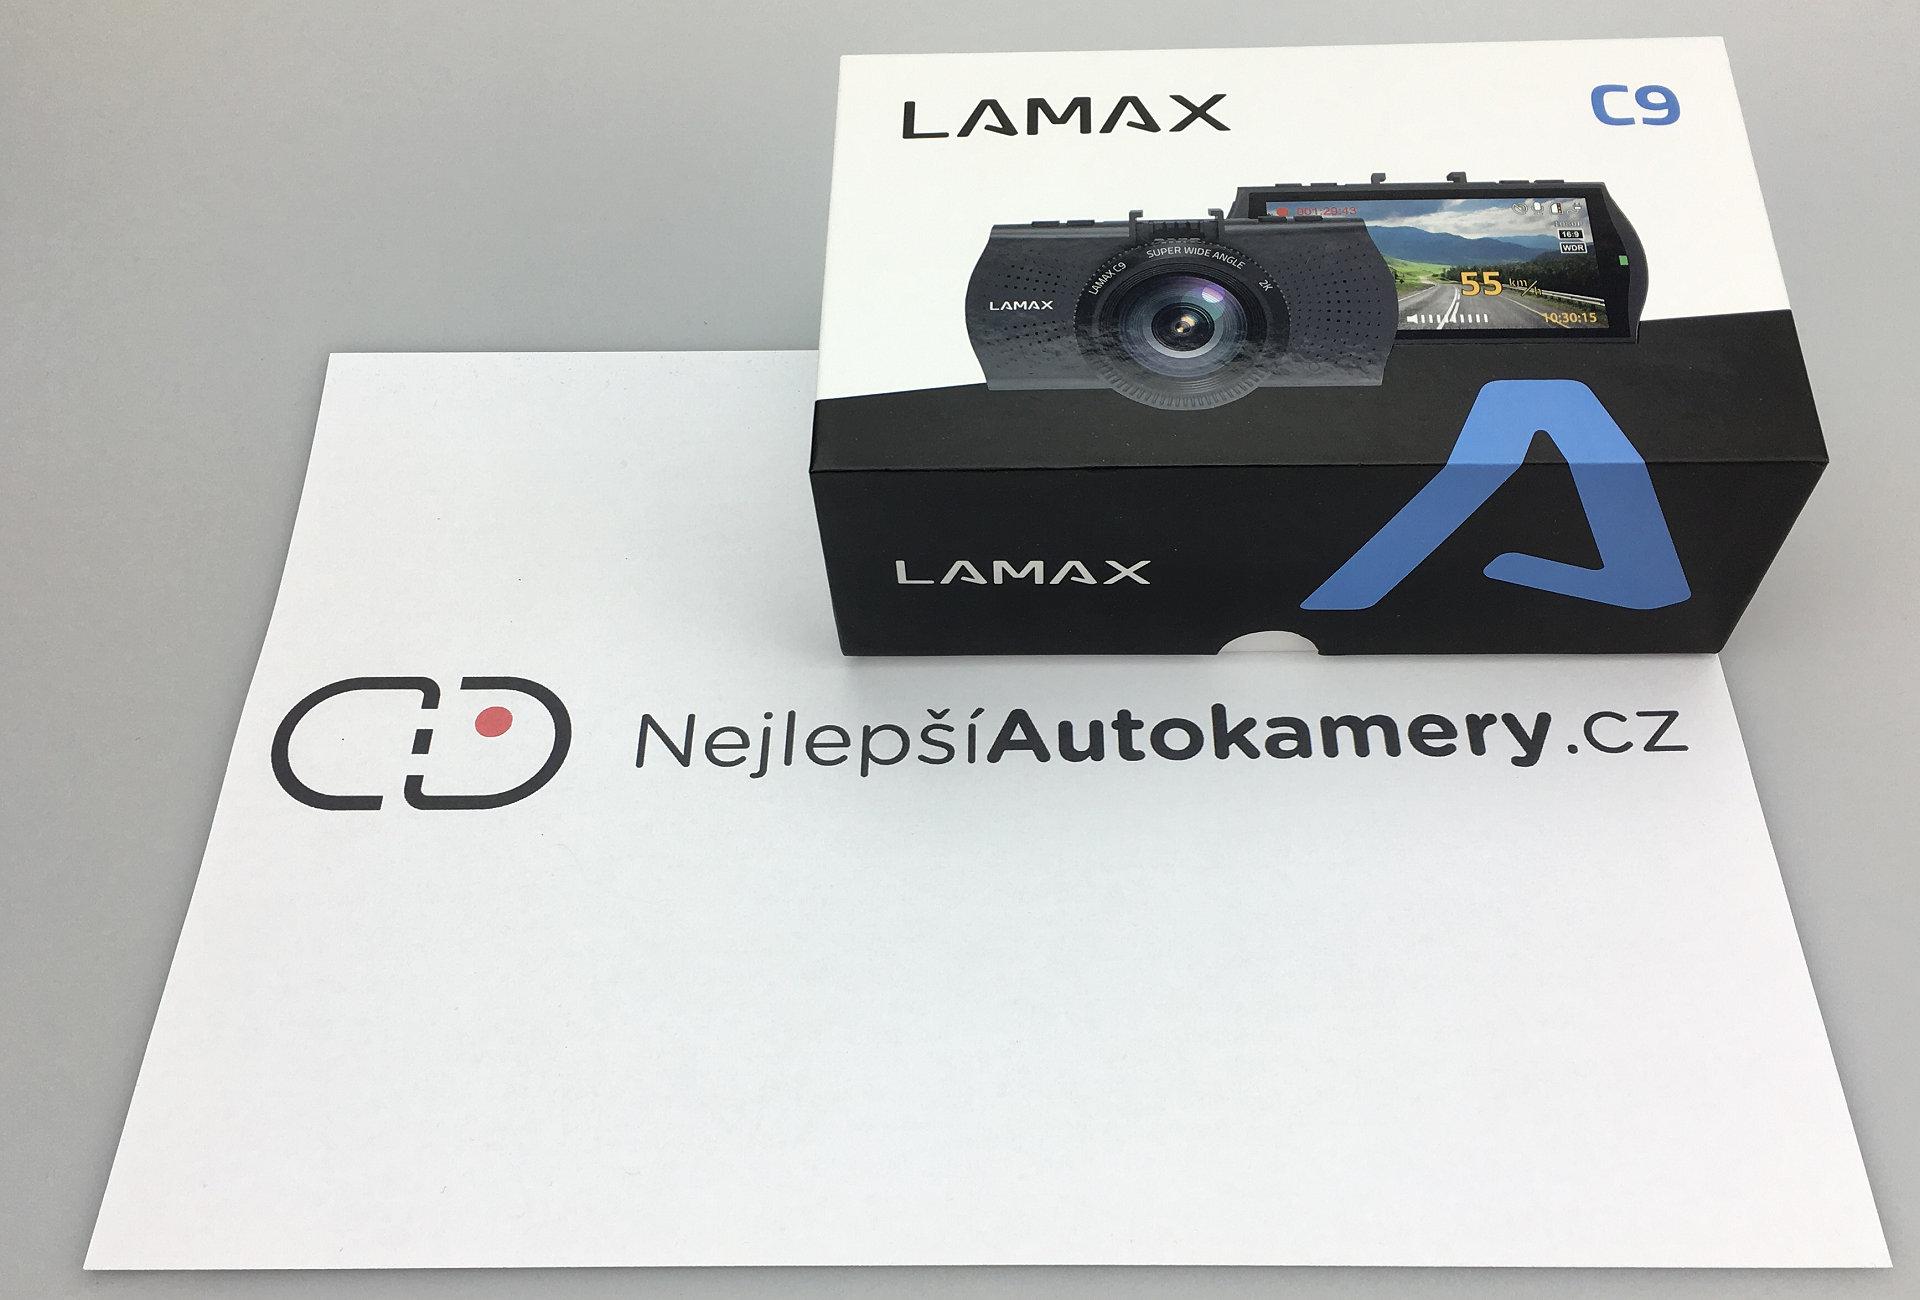 Recenze LAMAX C9 - fotka 1